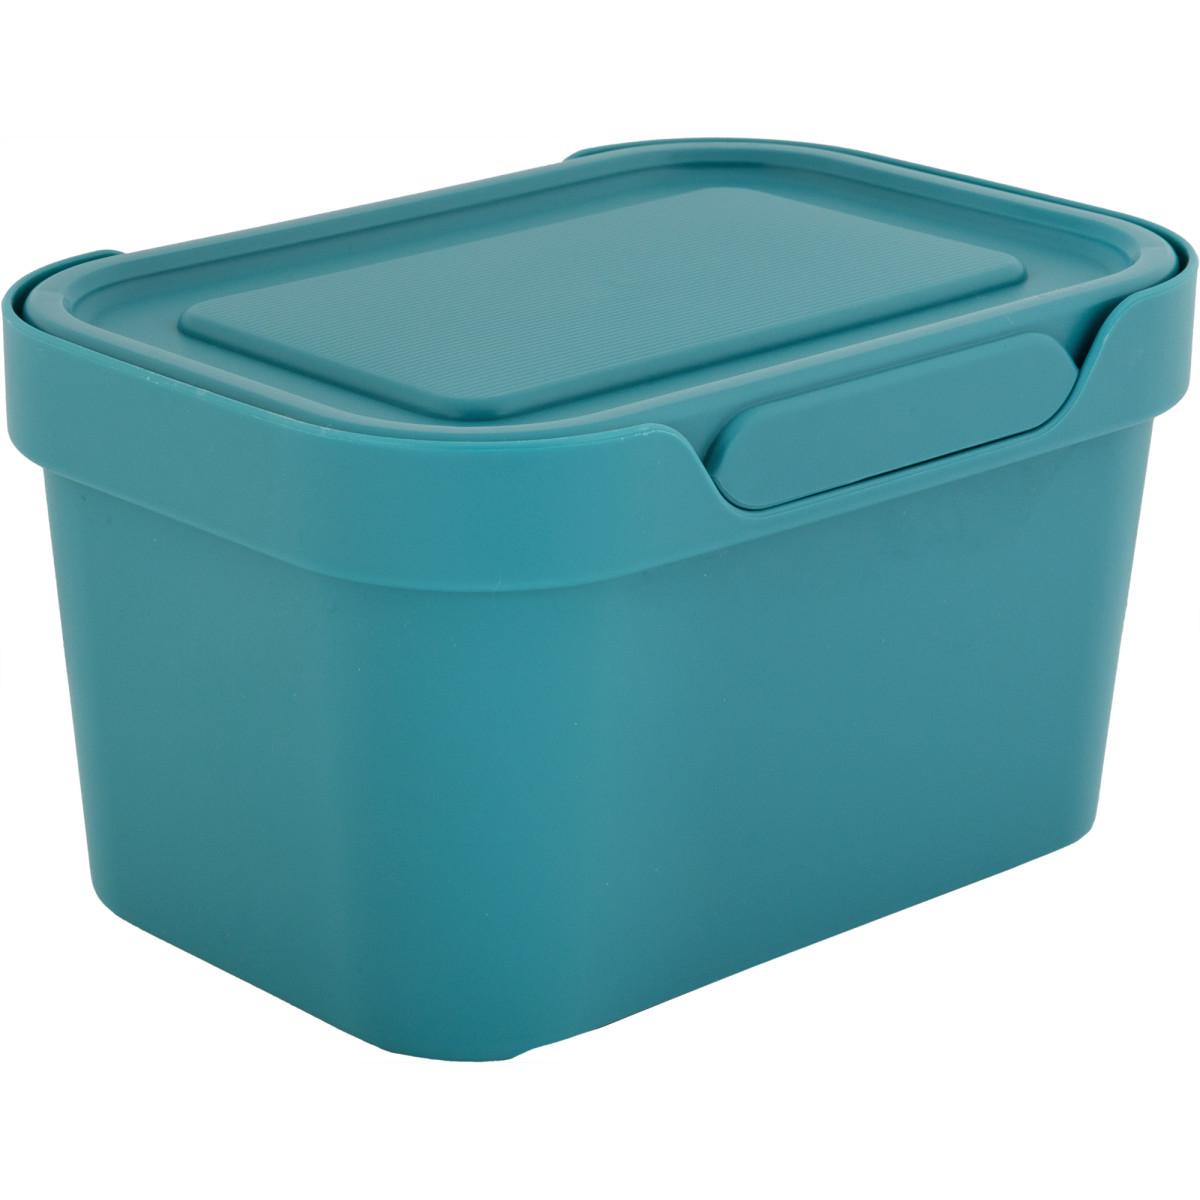 Ящик LUXE с крышкой 190х130х110 мм 19 л пластик цвет голубой